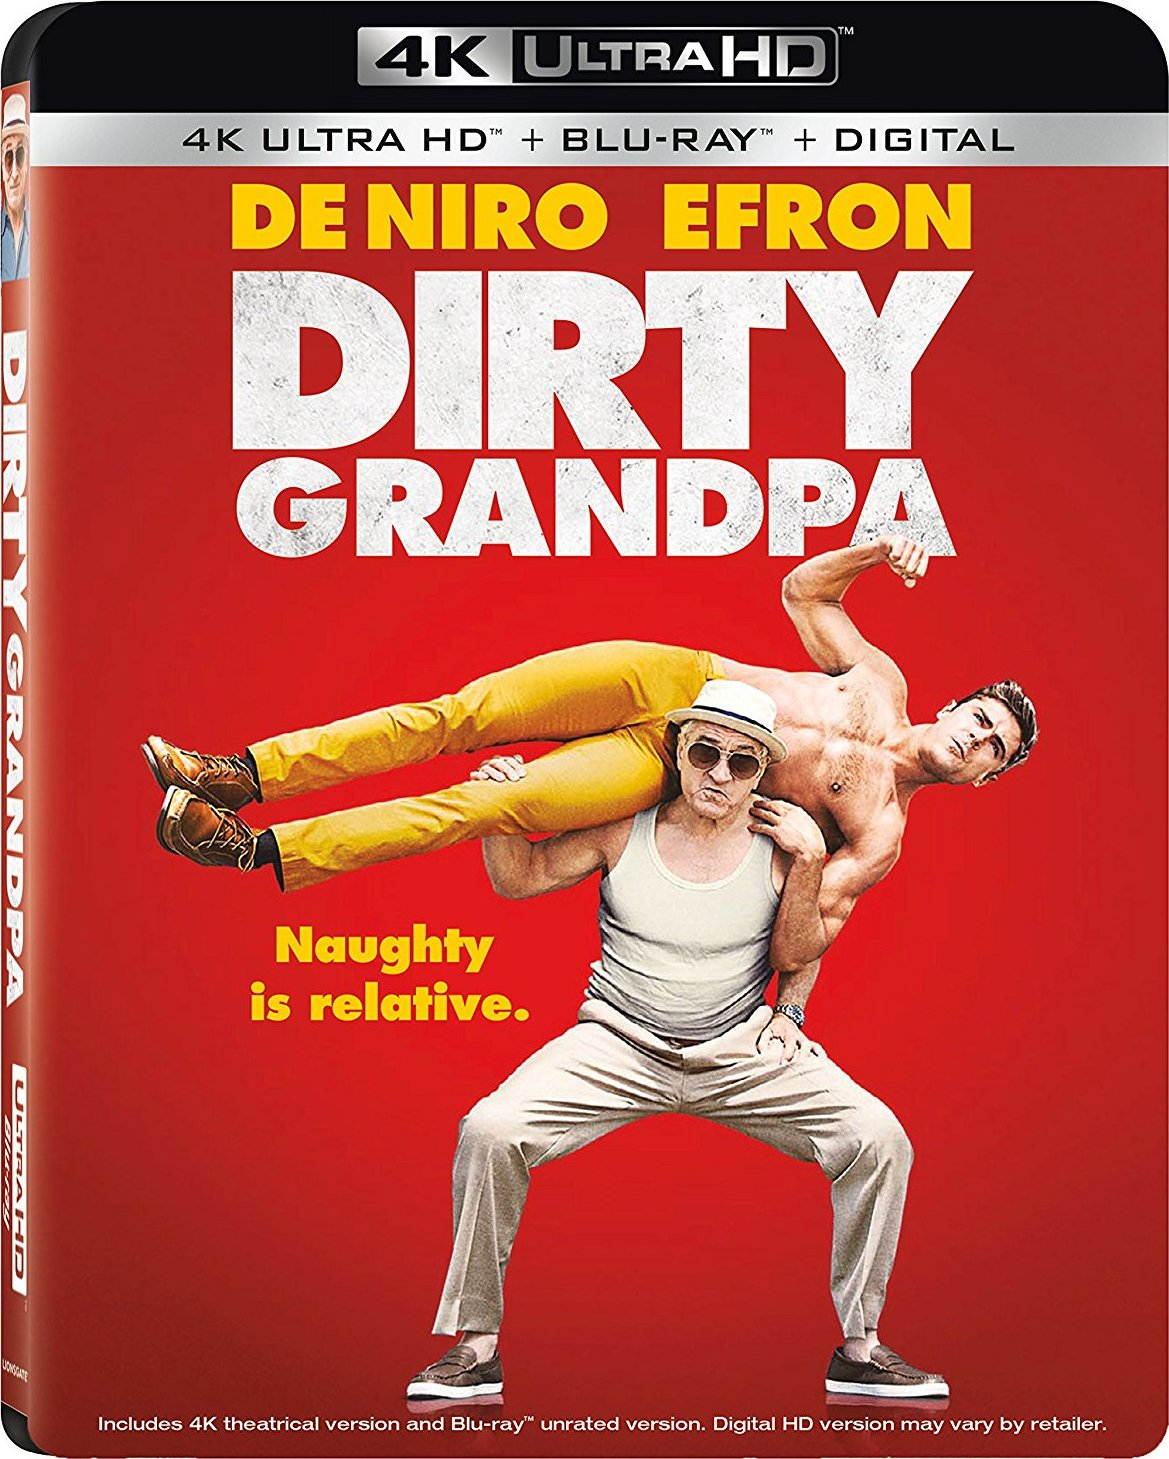 Dirty Grandpa (2016) 4K Ultra HD Blu-ray